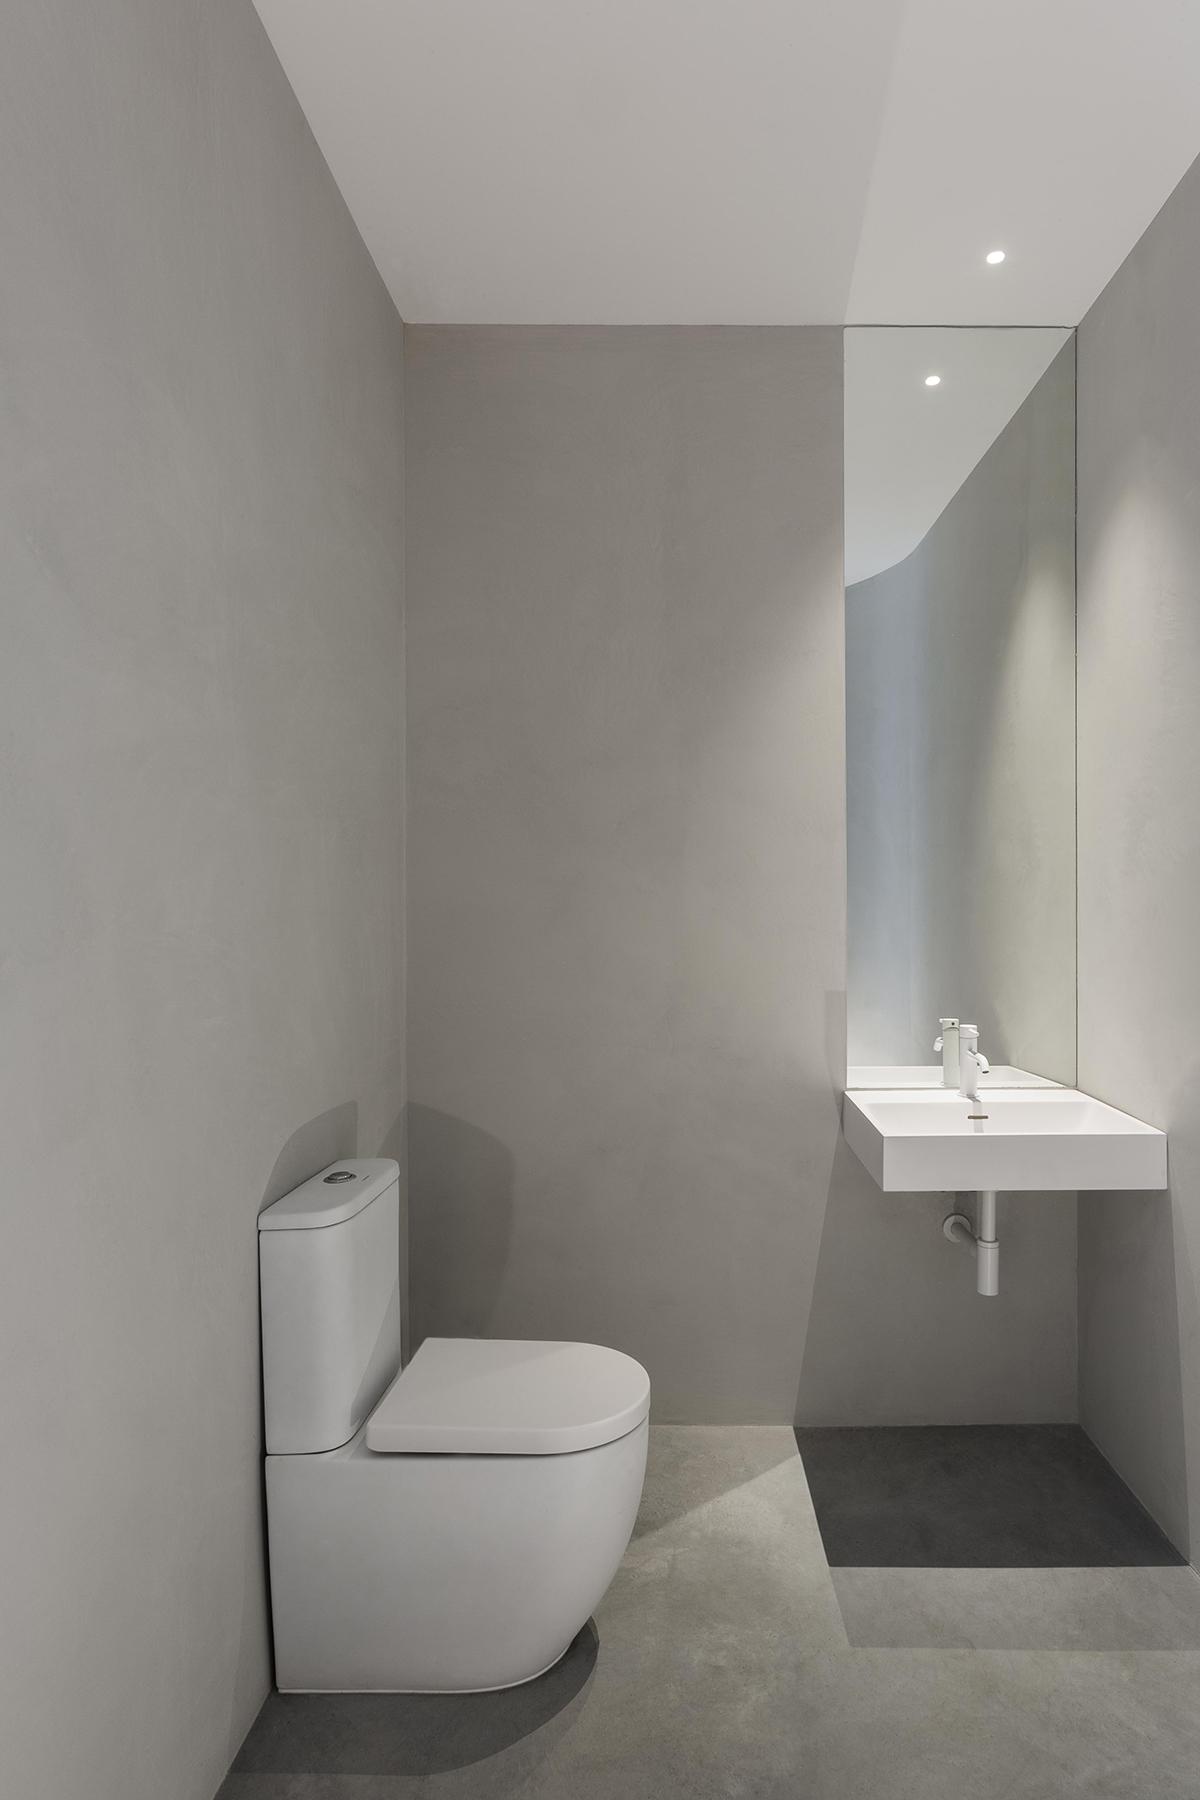 Baños microcemento en oficinas